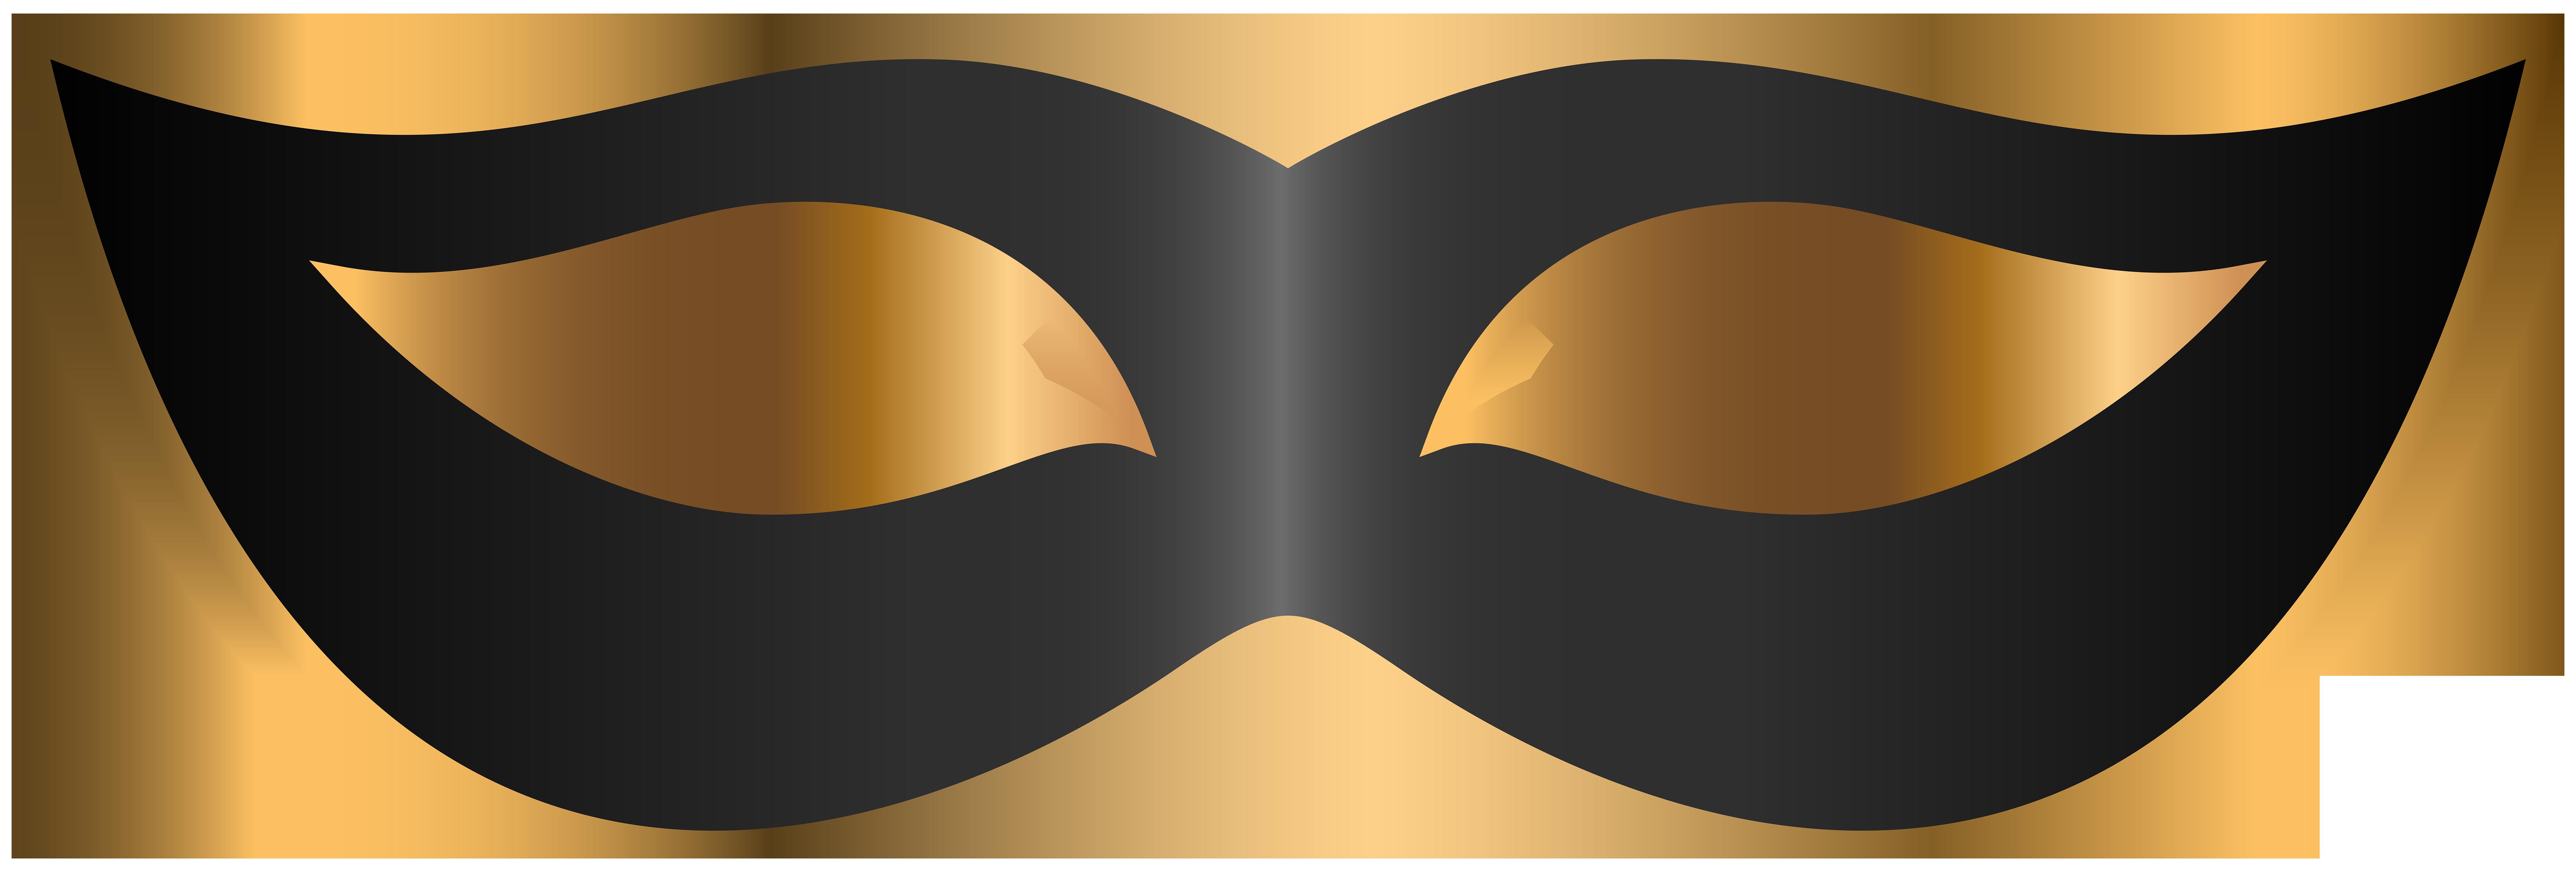 Black Mask Clipart.